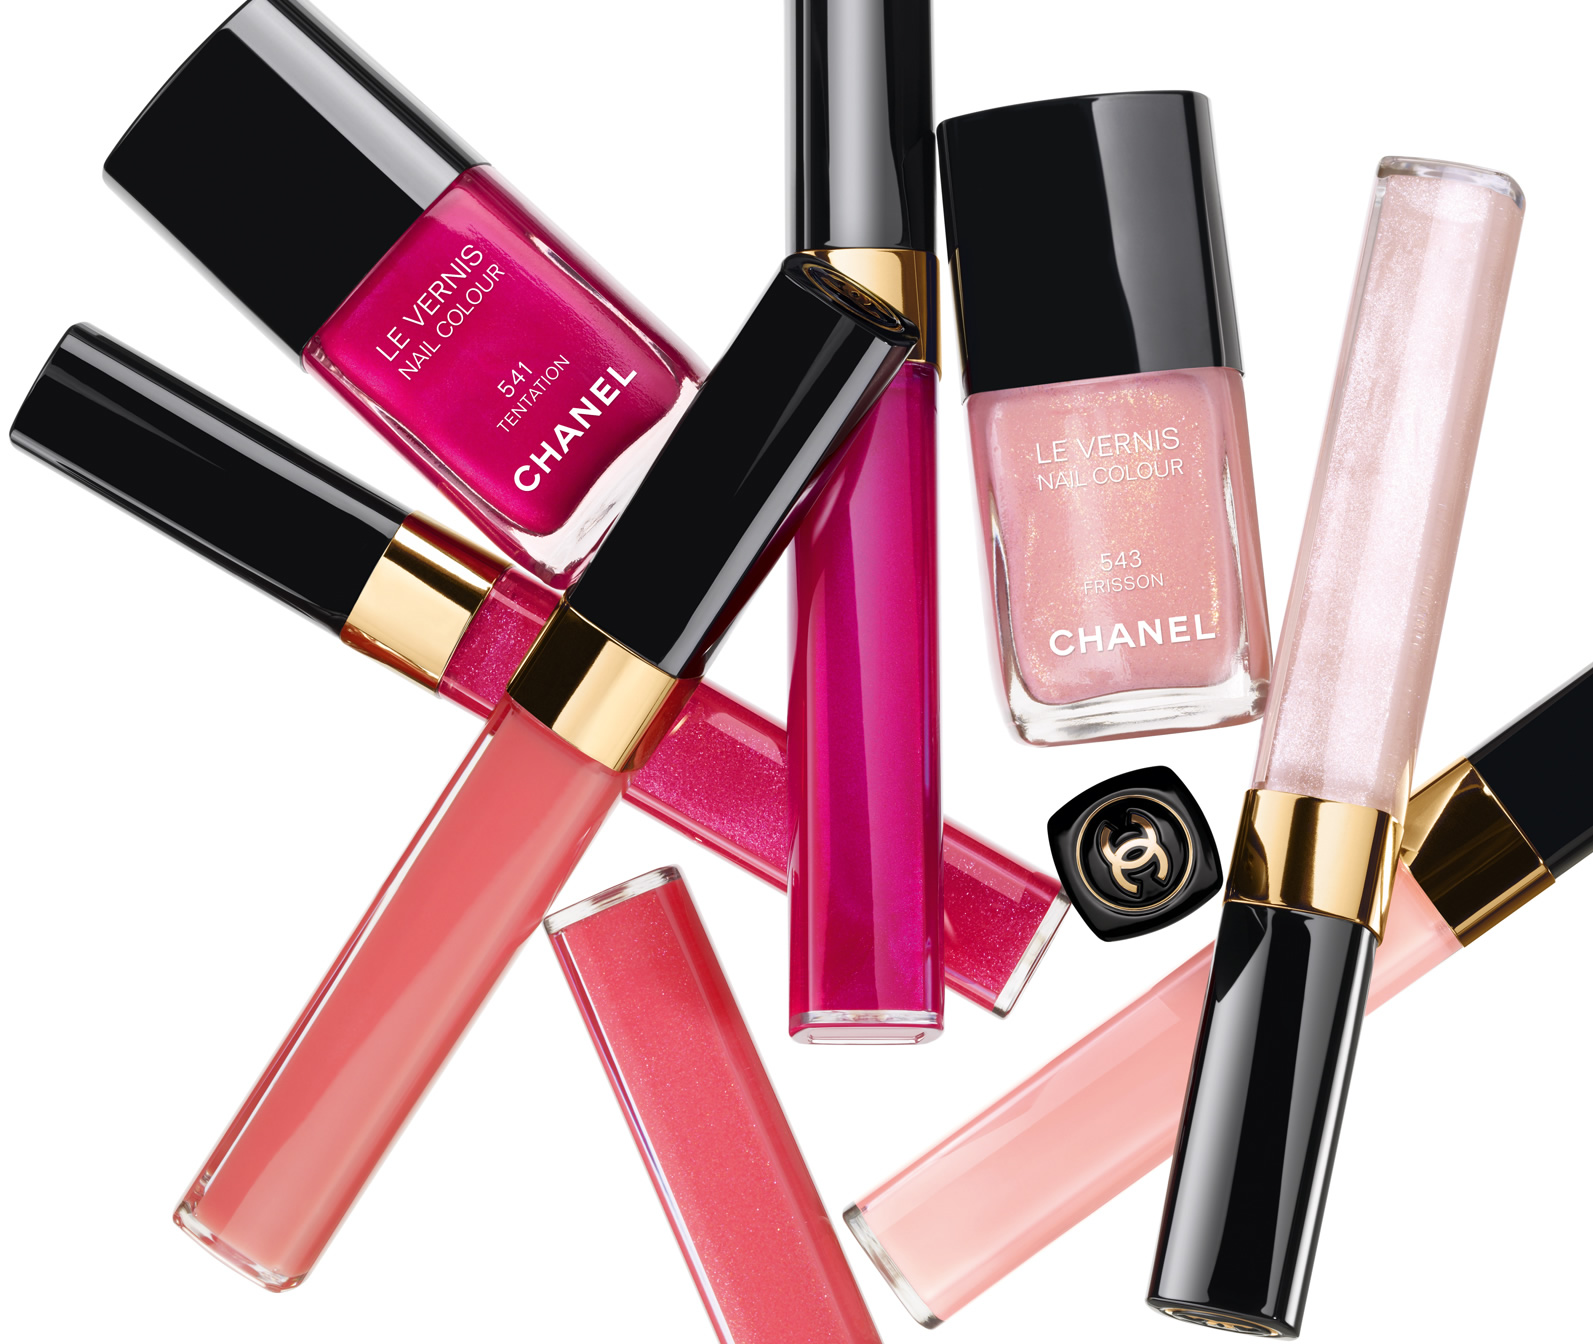 Beauty Cosmetics: Tops The List: Top 10 Luxury Cosmetics Brands